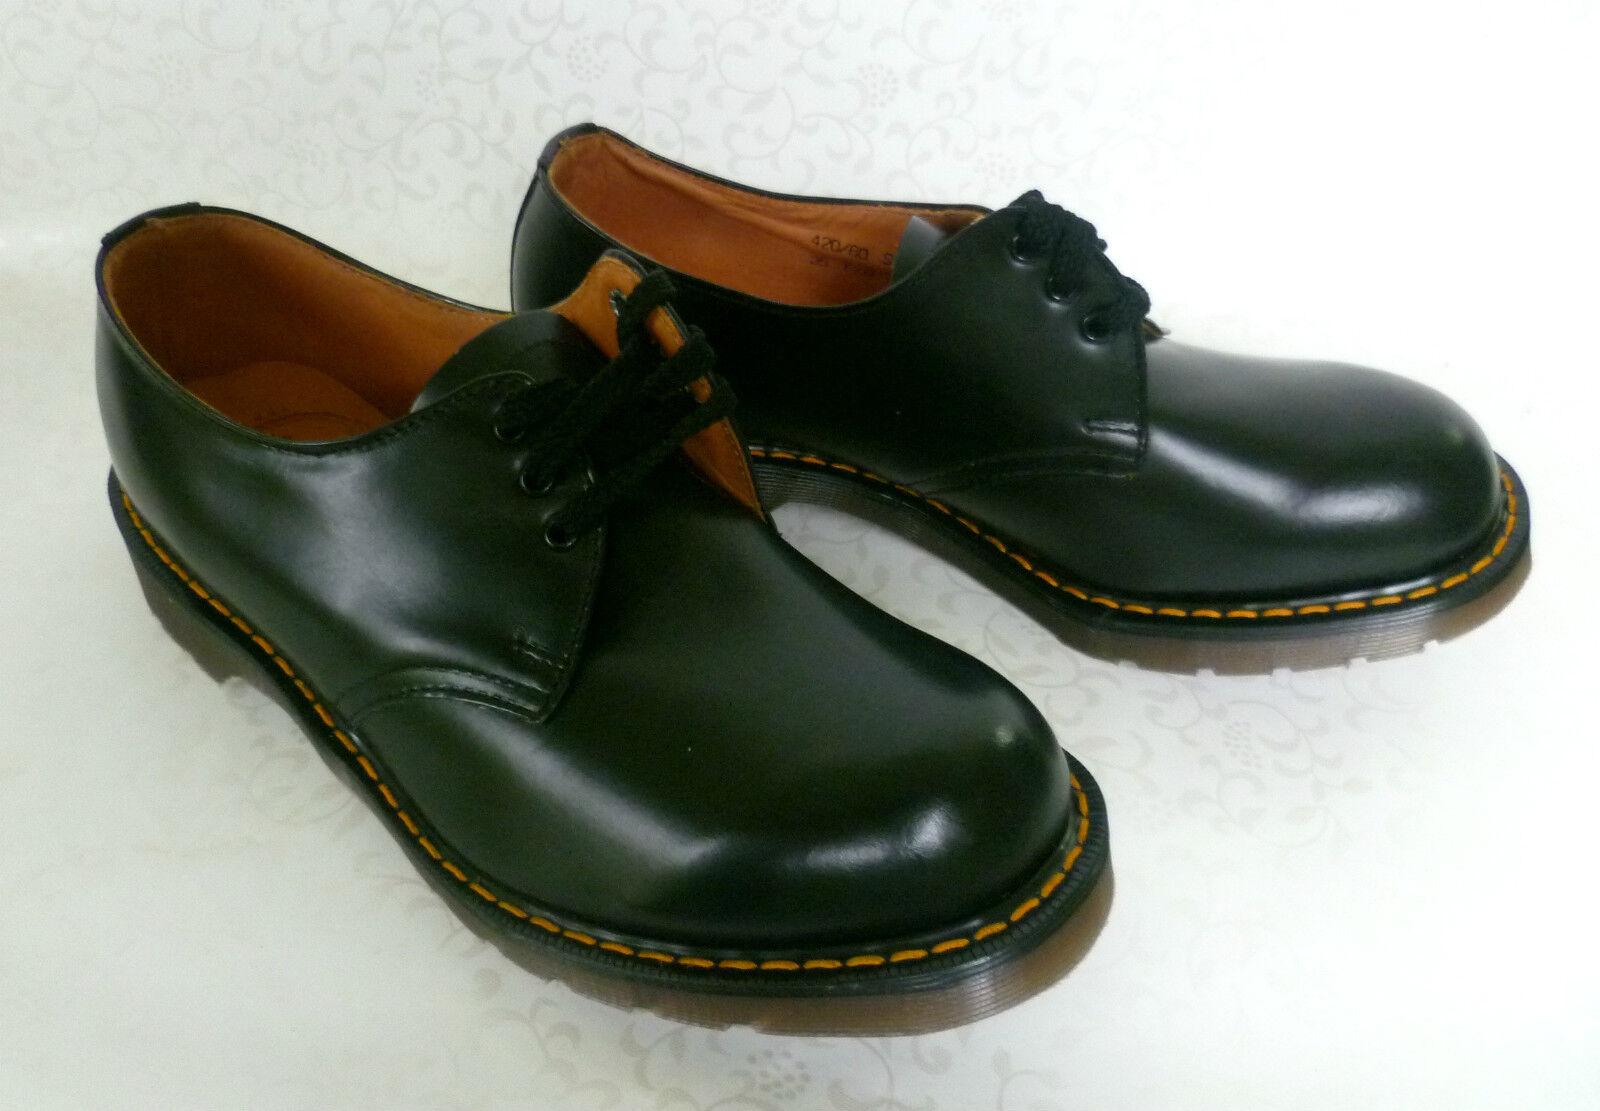 Dr. Martens Black Lea Tie Shoe, 3-Loch Halbschuh, Gr. 36, 38, 39